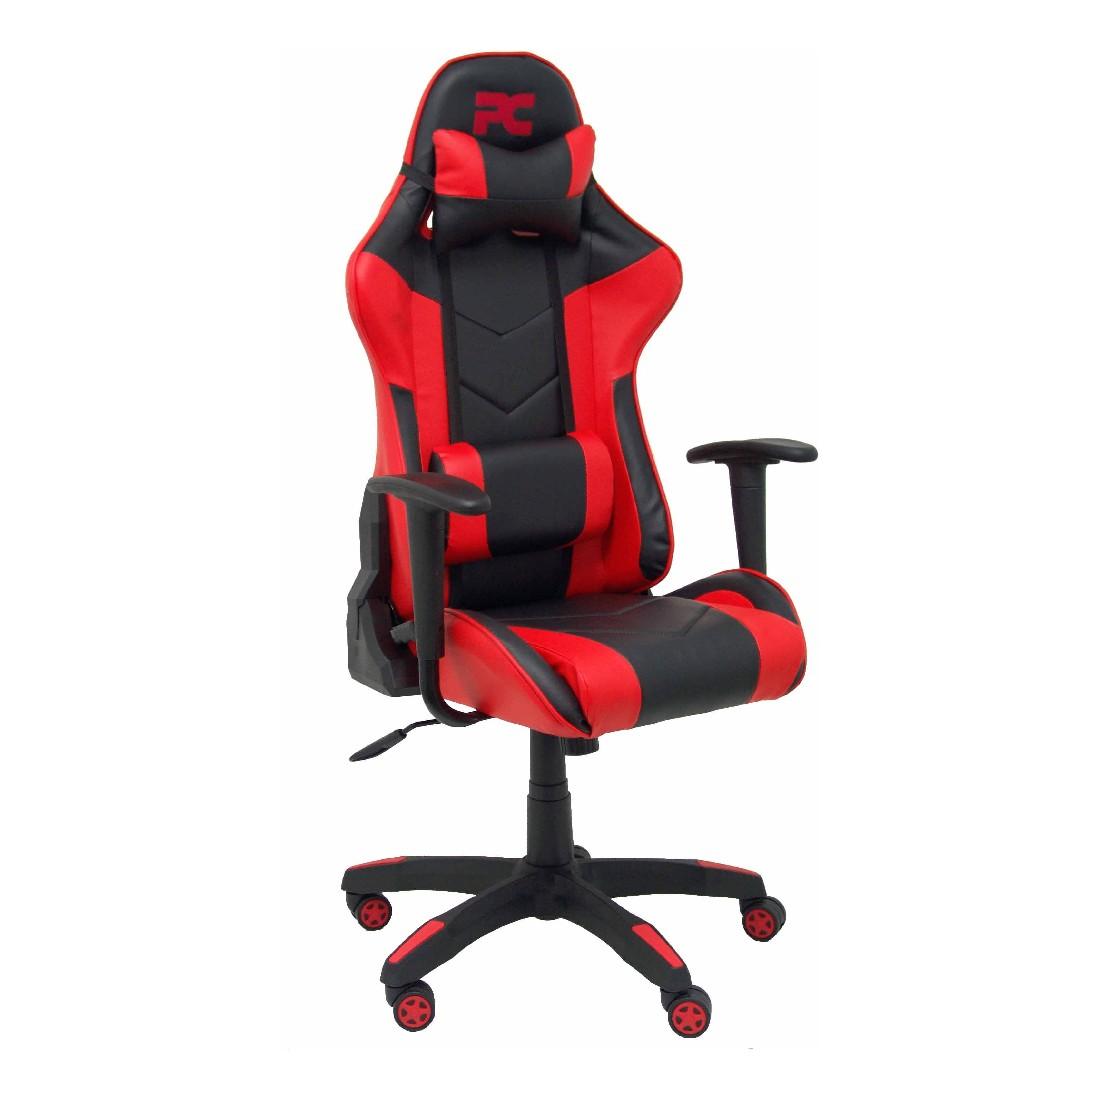 Gaming Chair Atalaya P&C 7DBSPRJ Black Red